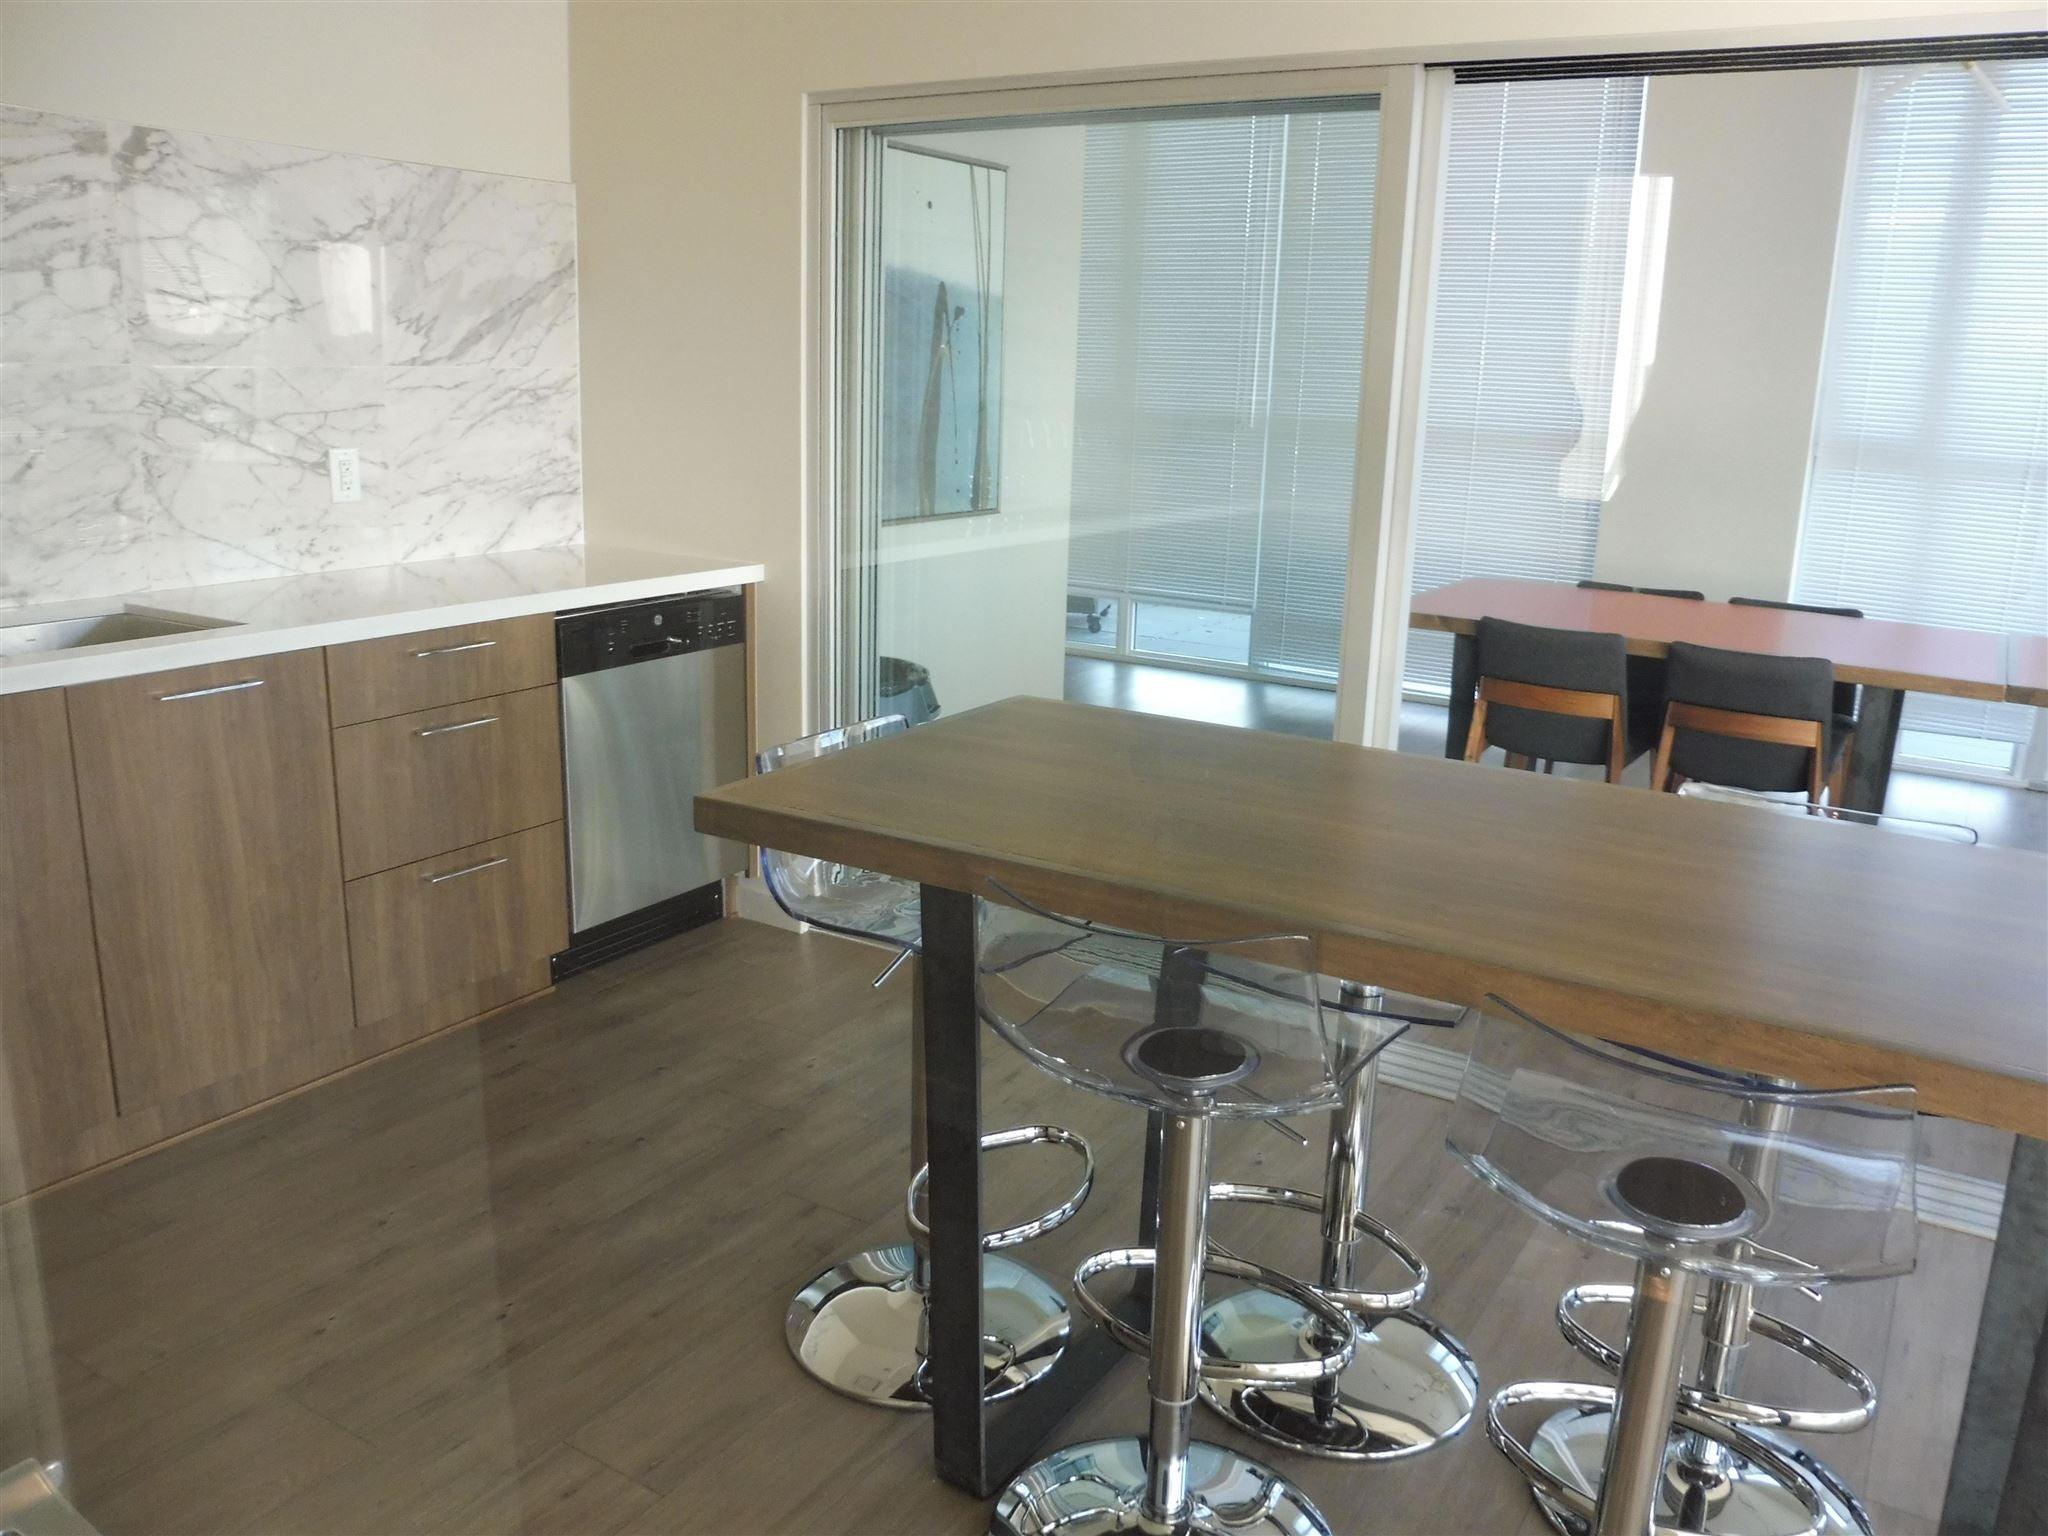 1409 691 NORTH ROAD - Coquitlam West Apartment/Condo for sale, 2 Bedrooms (R2604155) - #24